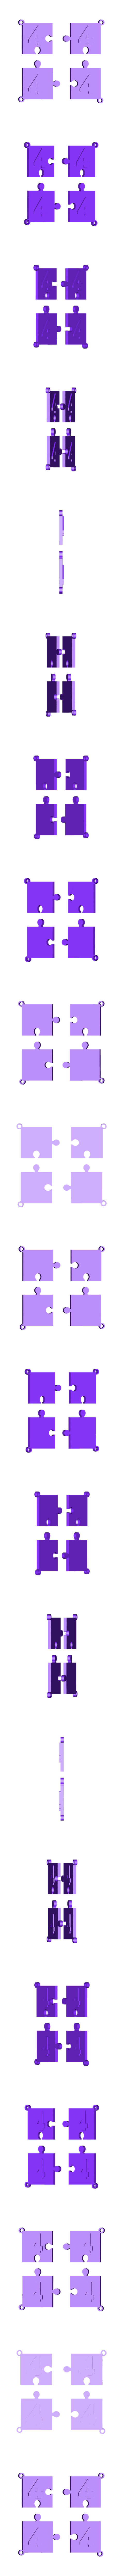 puzzle 4.stl Download STL file puzzle key ring • 3D printing design, catf3d